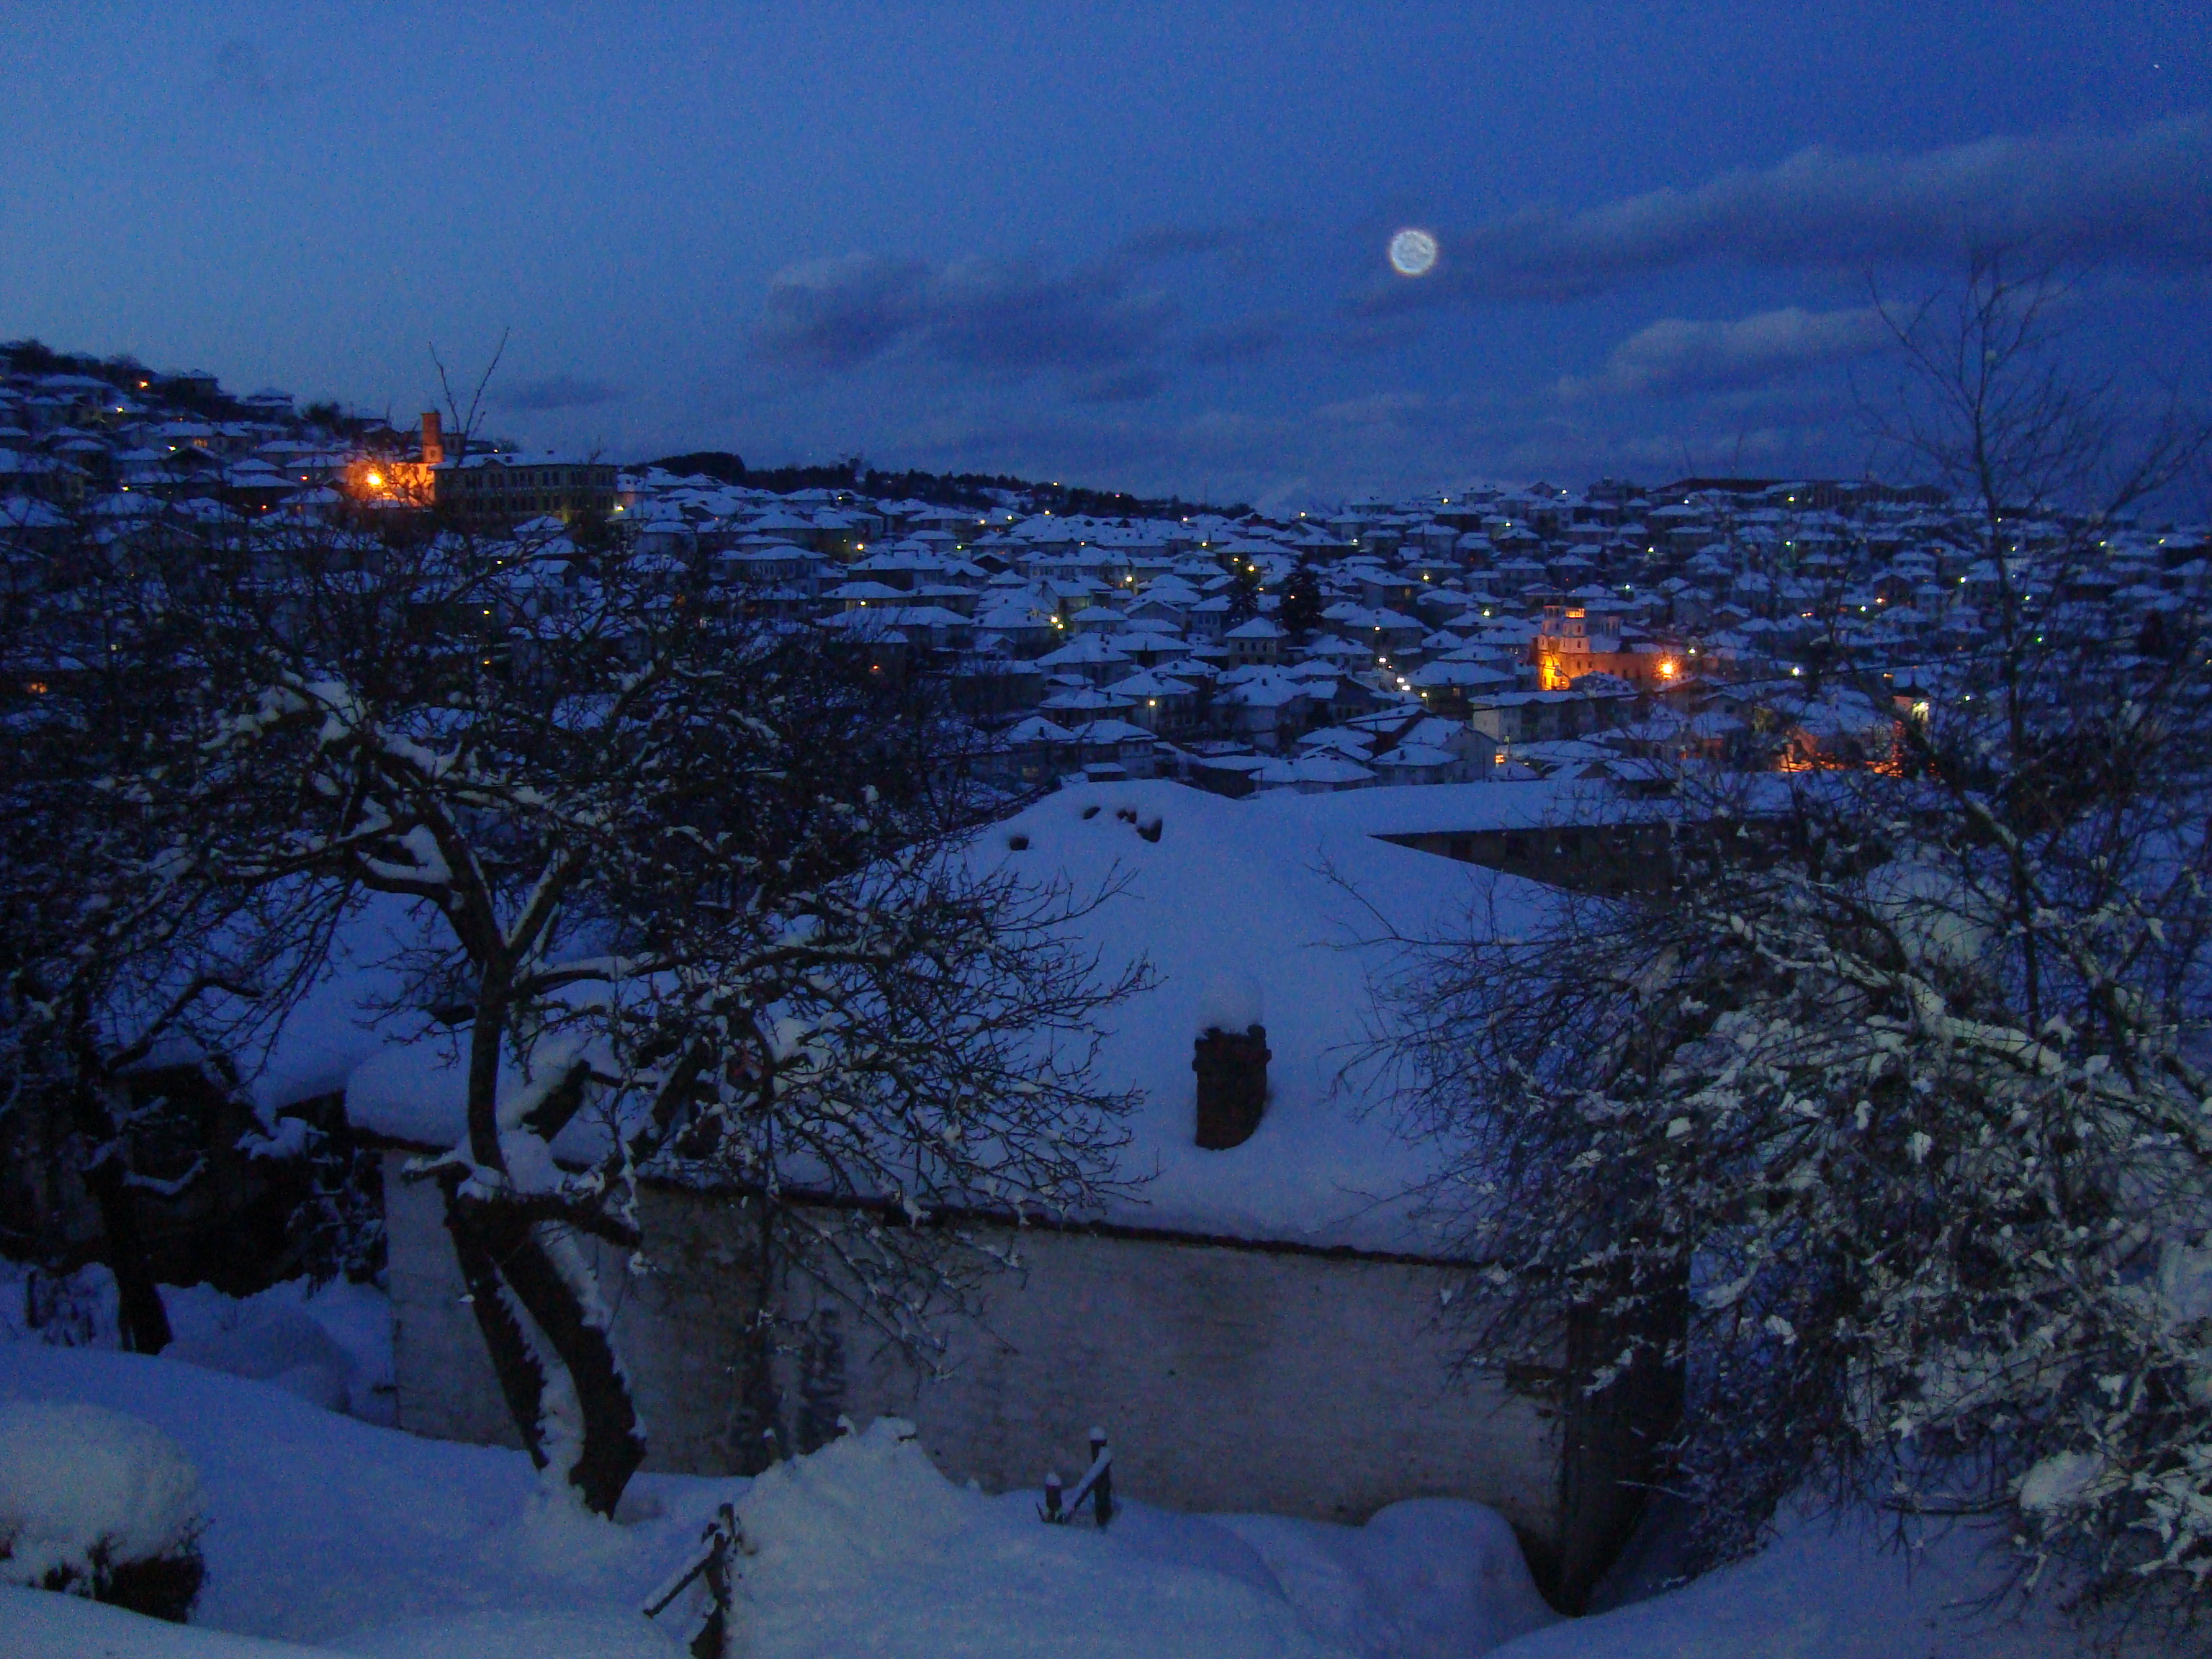 Night wiew to the baeautiful small town, Krushevo